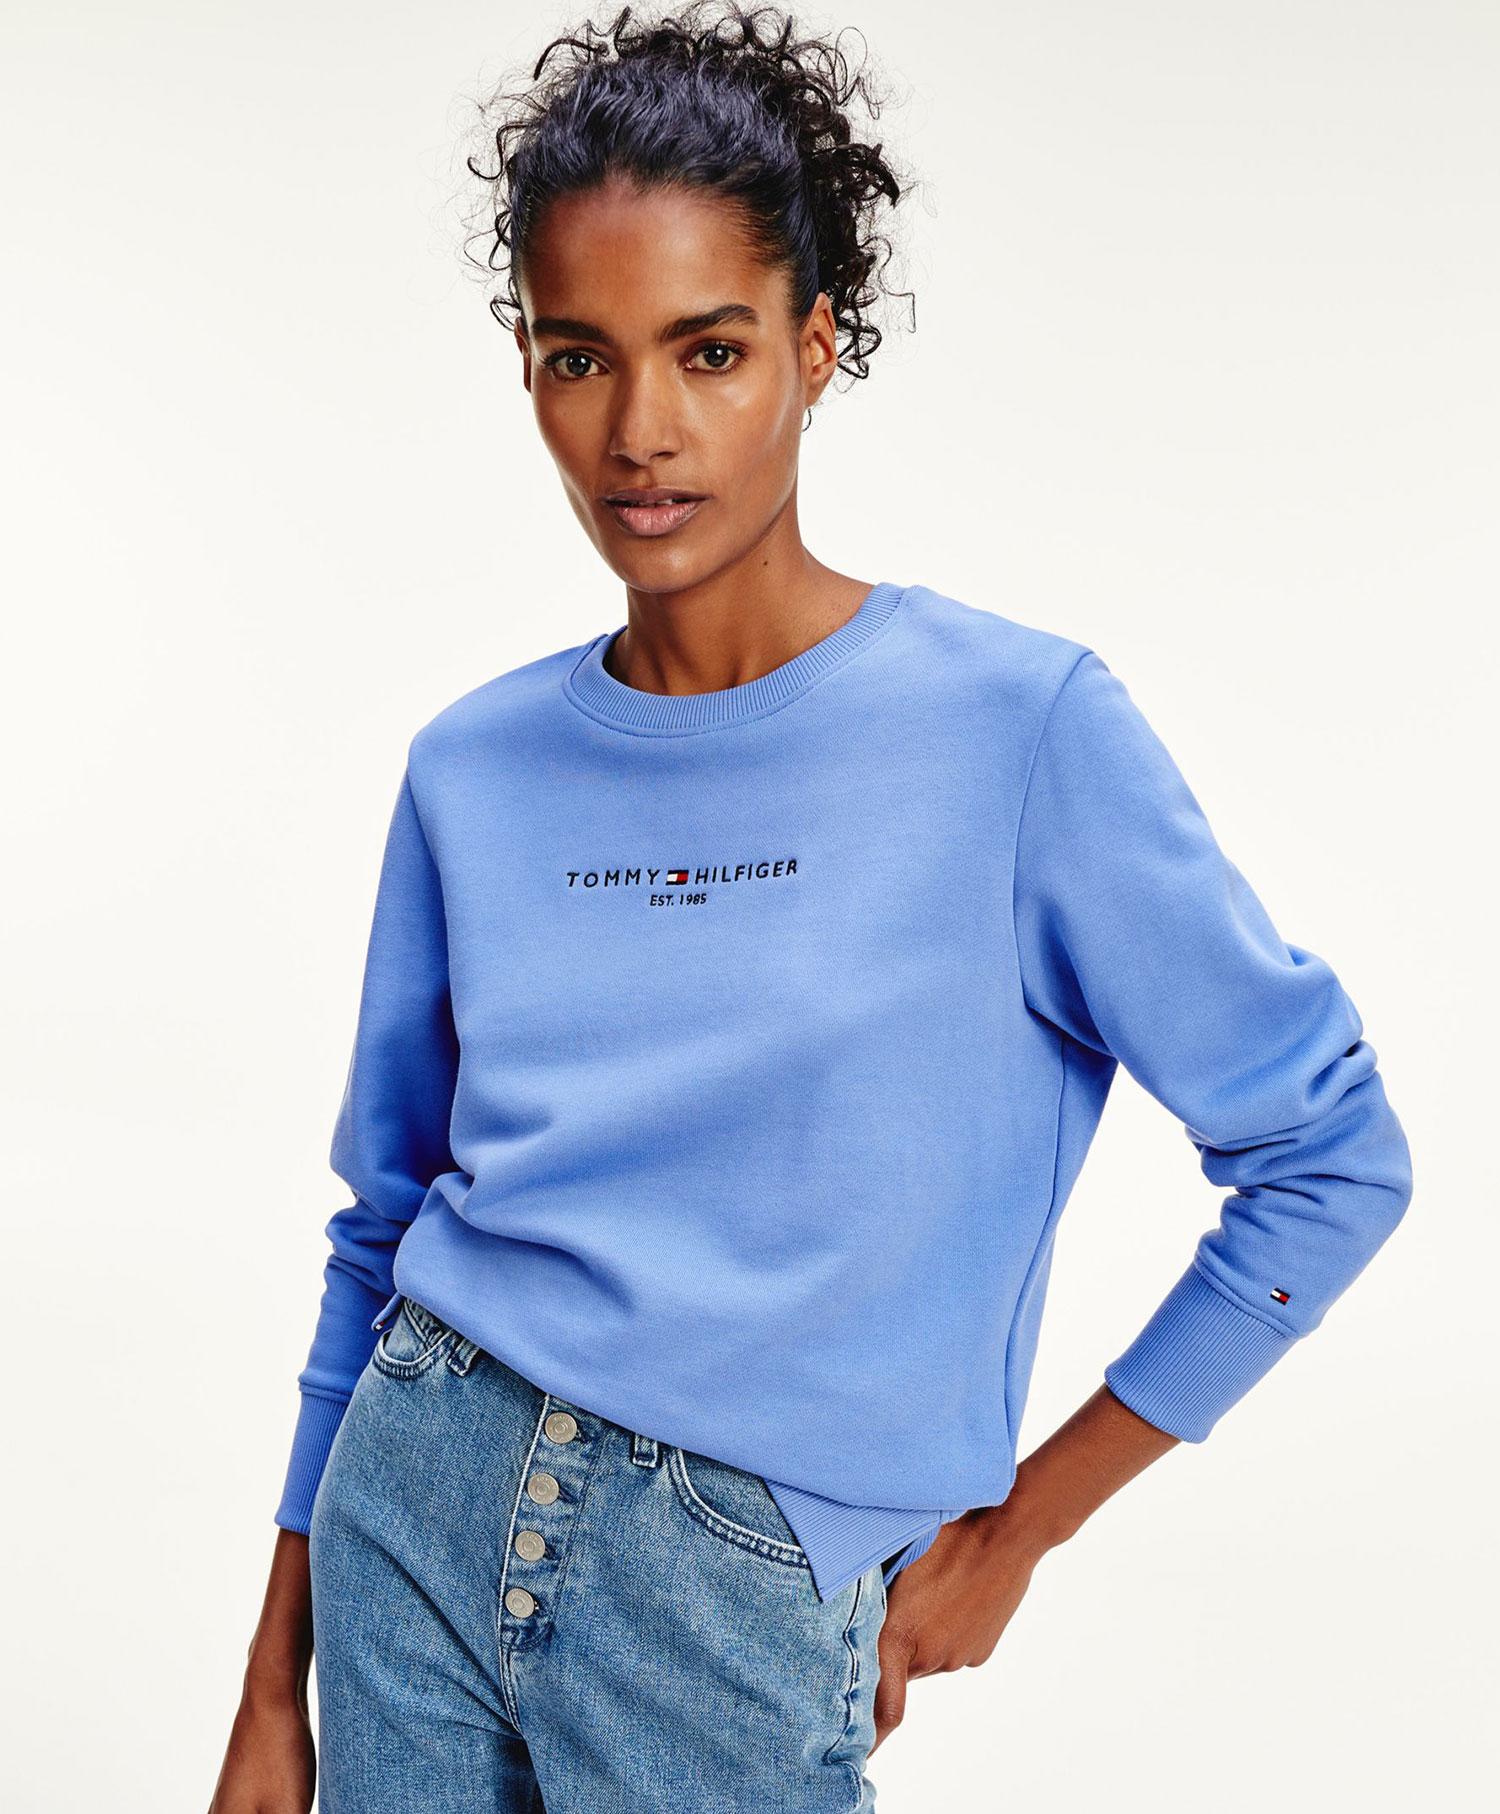 Hilfiger C-NK Sweatshirt